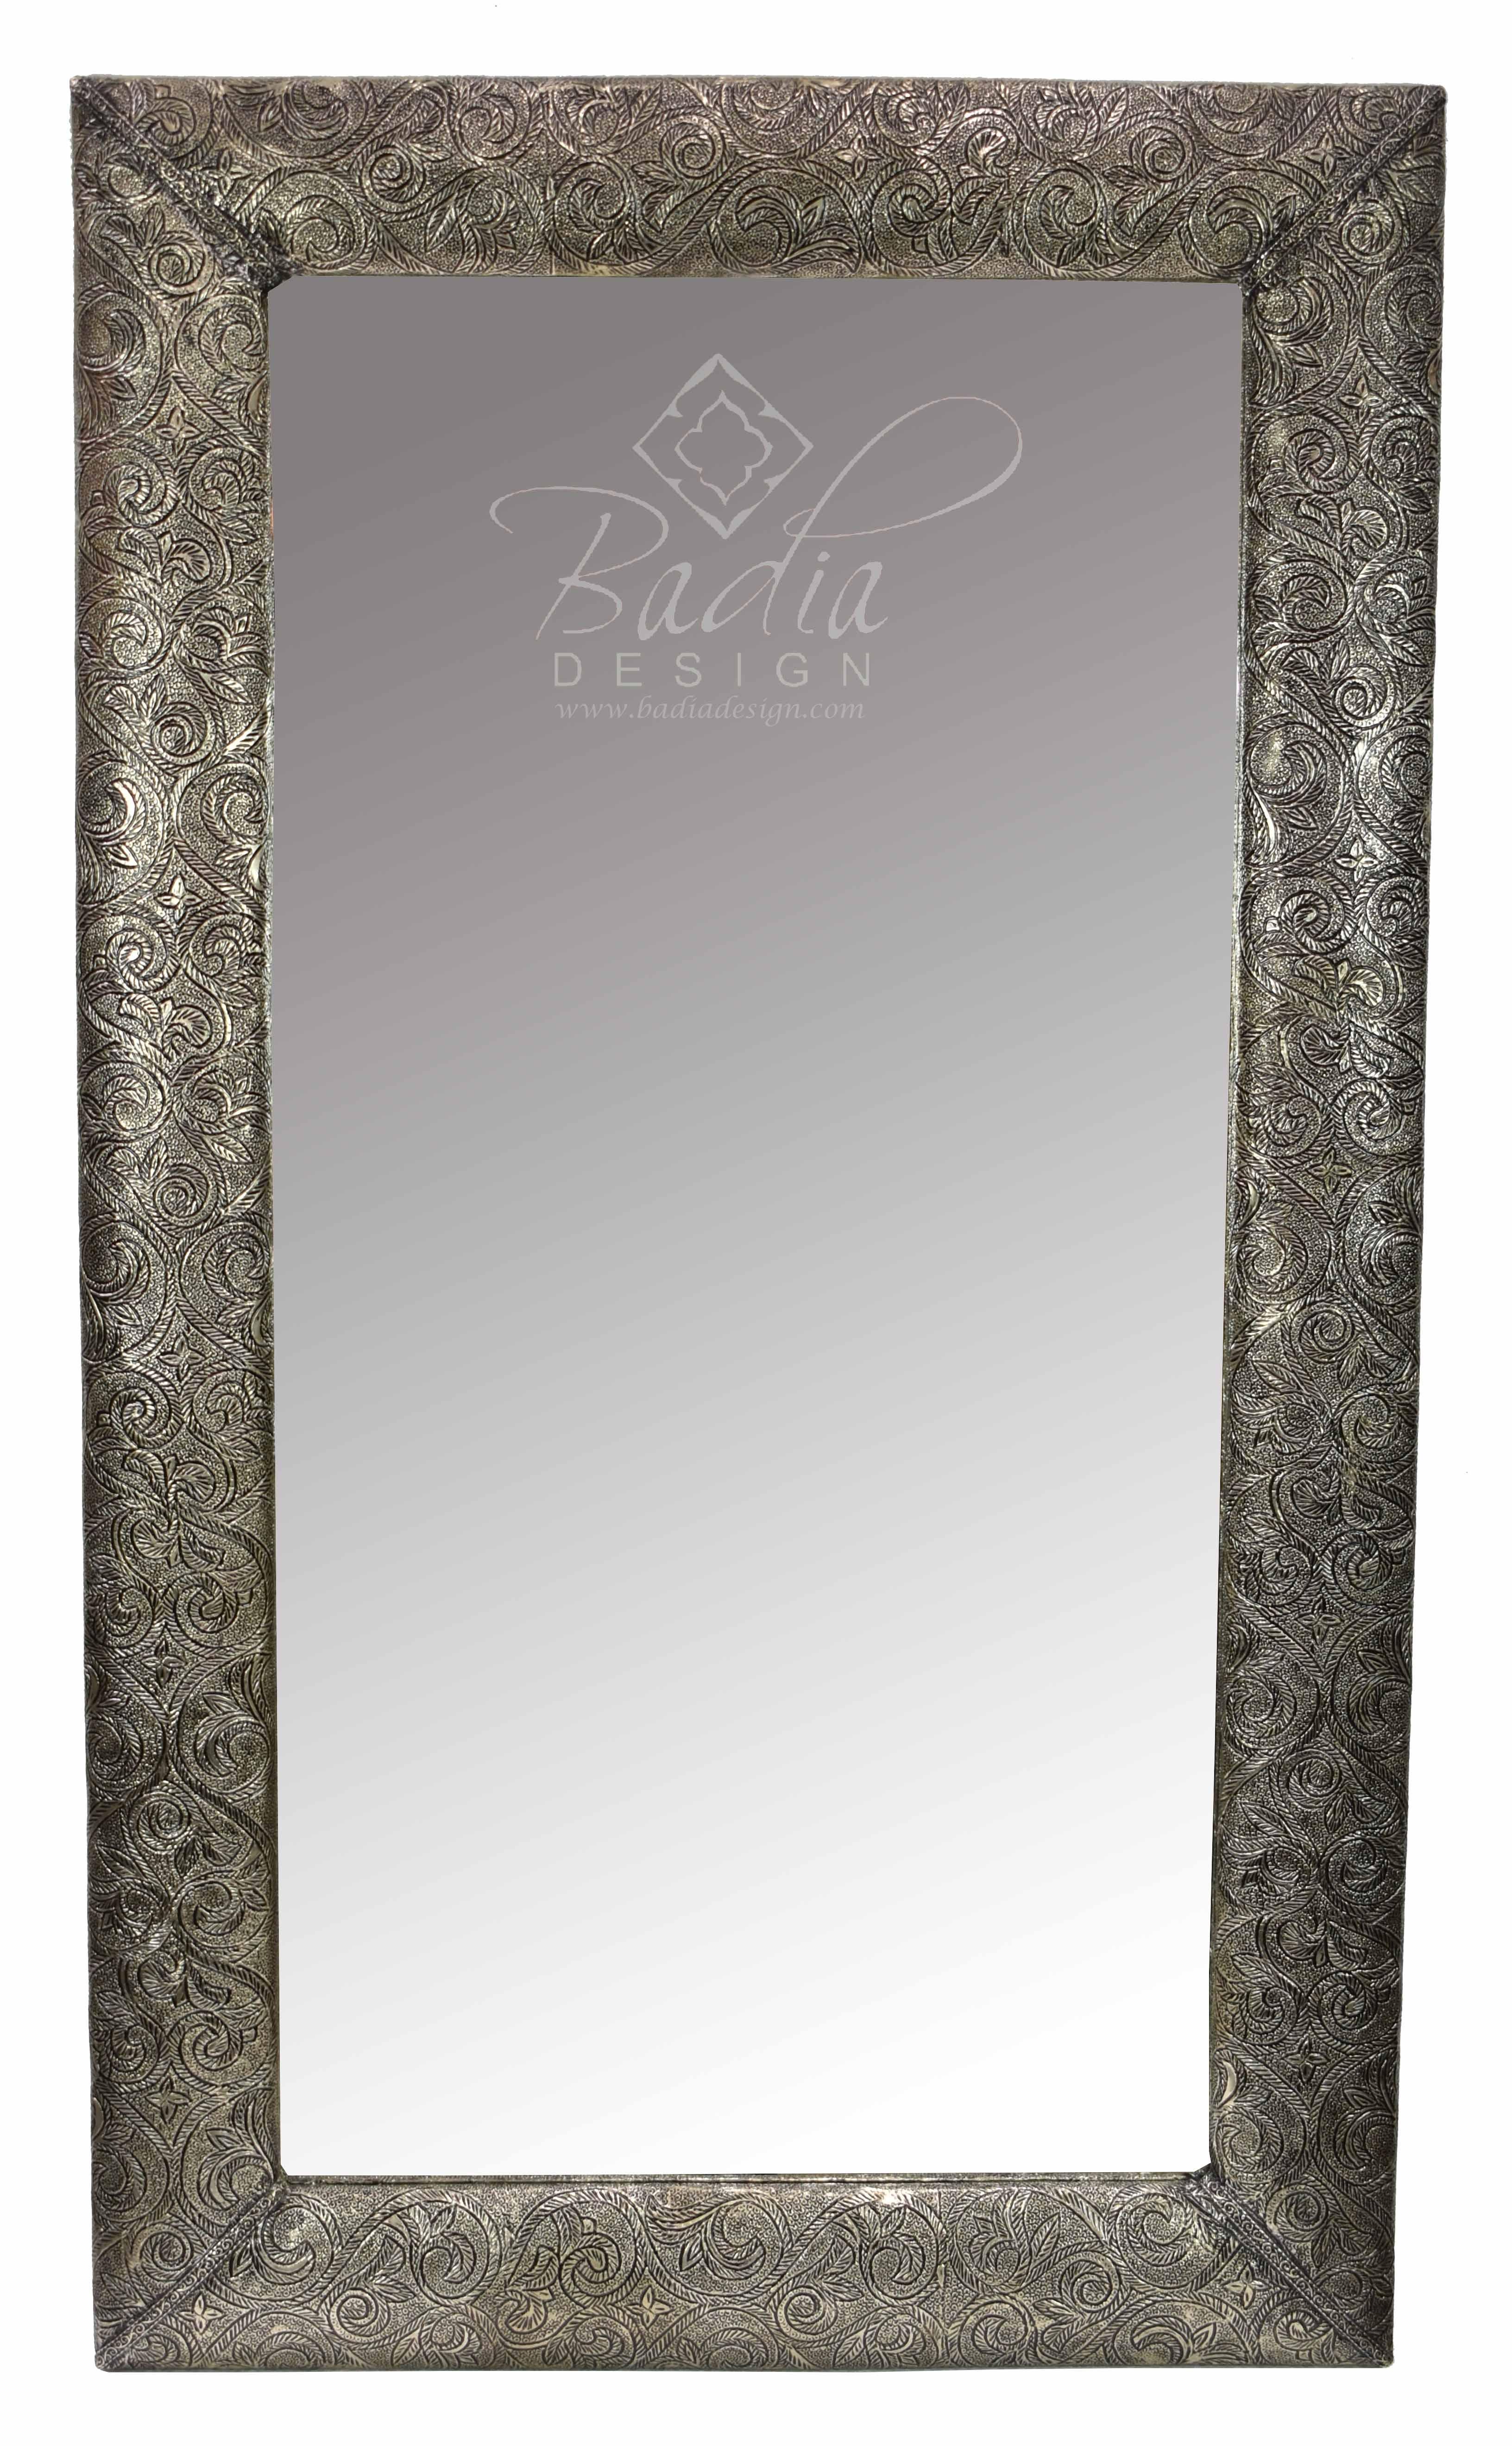 moroccan-rectangular-shaped-embossed-silver-nickel-mirror-m-em020.jpg